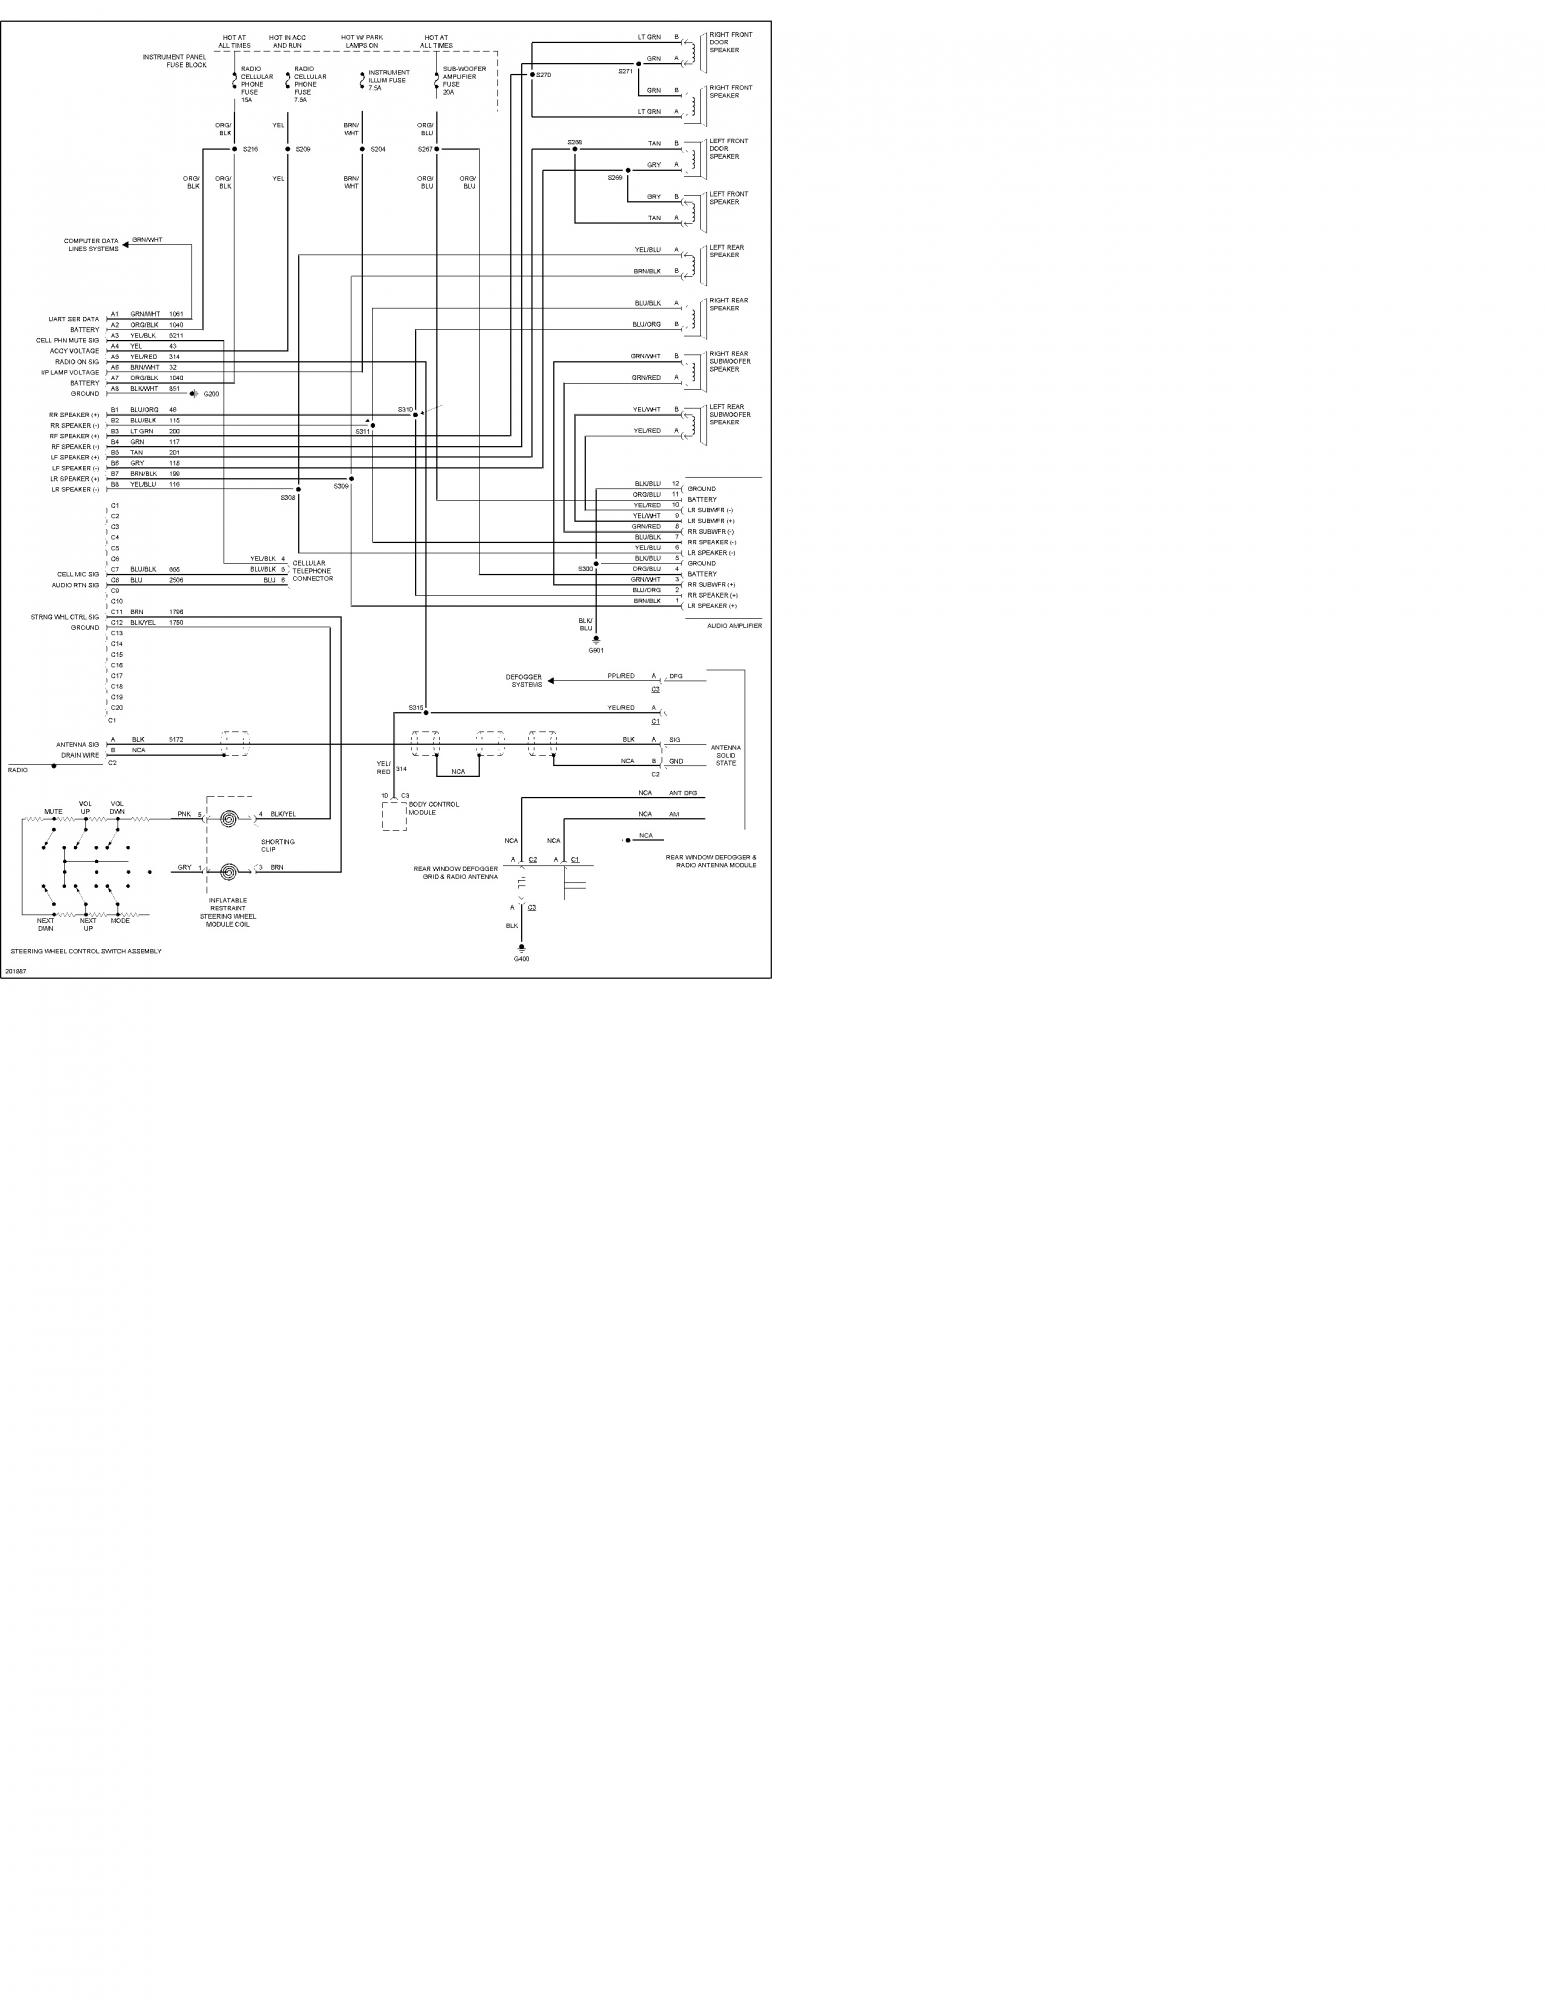 turn on remote wire kenwood ddx418 wiring diagram turn wiring diagram for kenwood ddx371 the wiring diagram